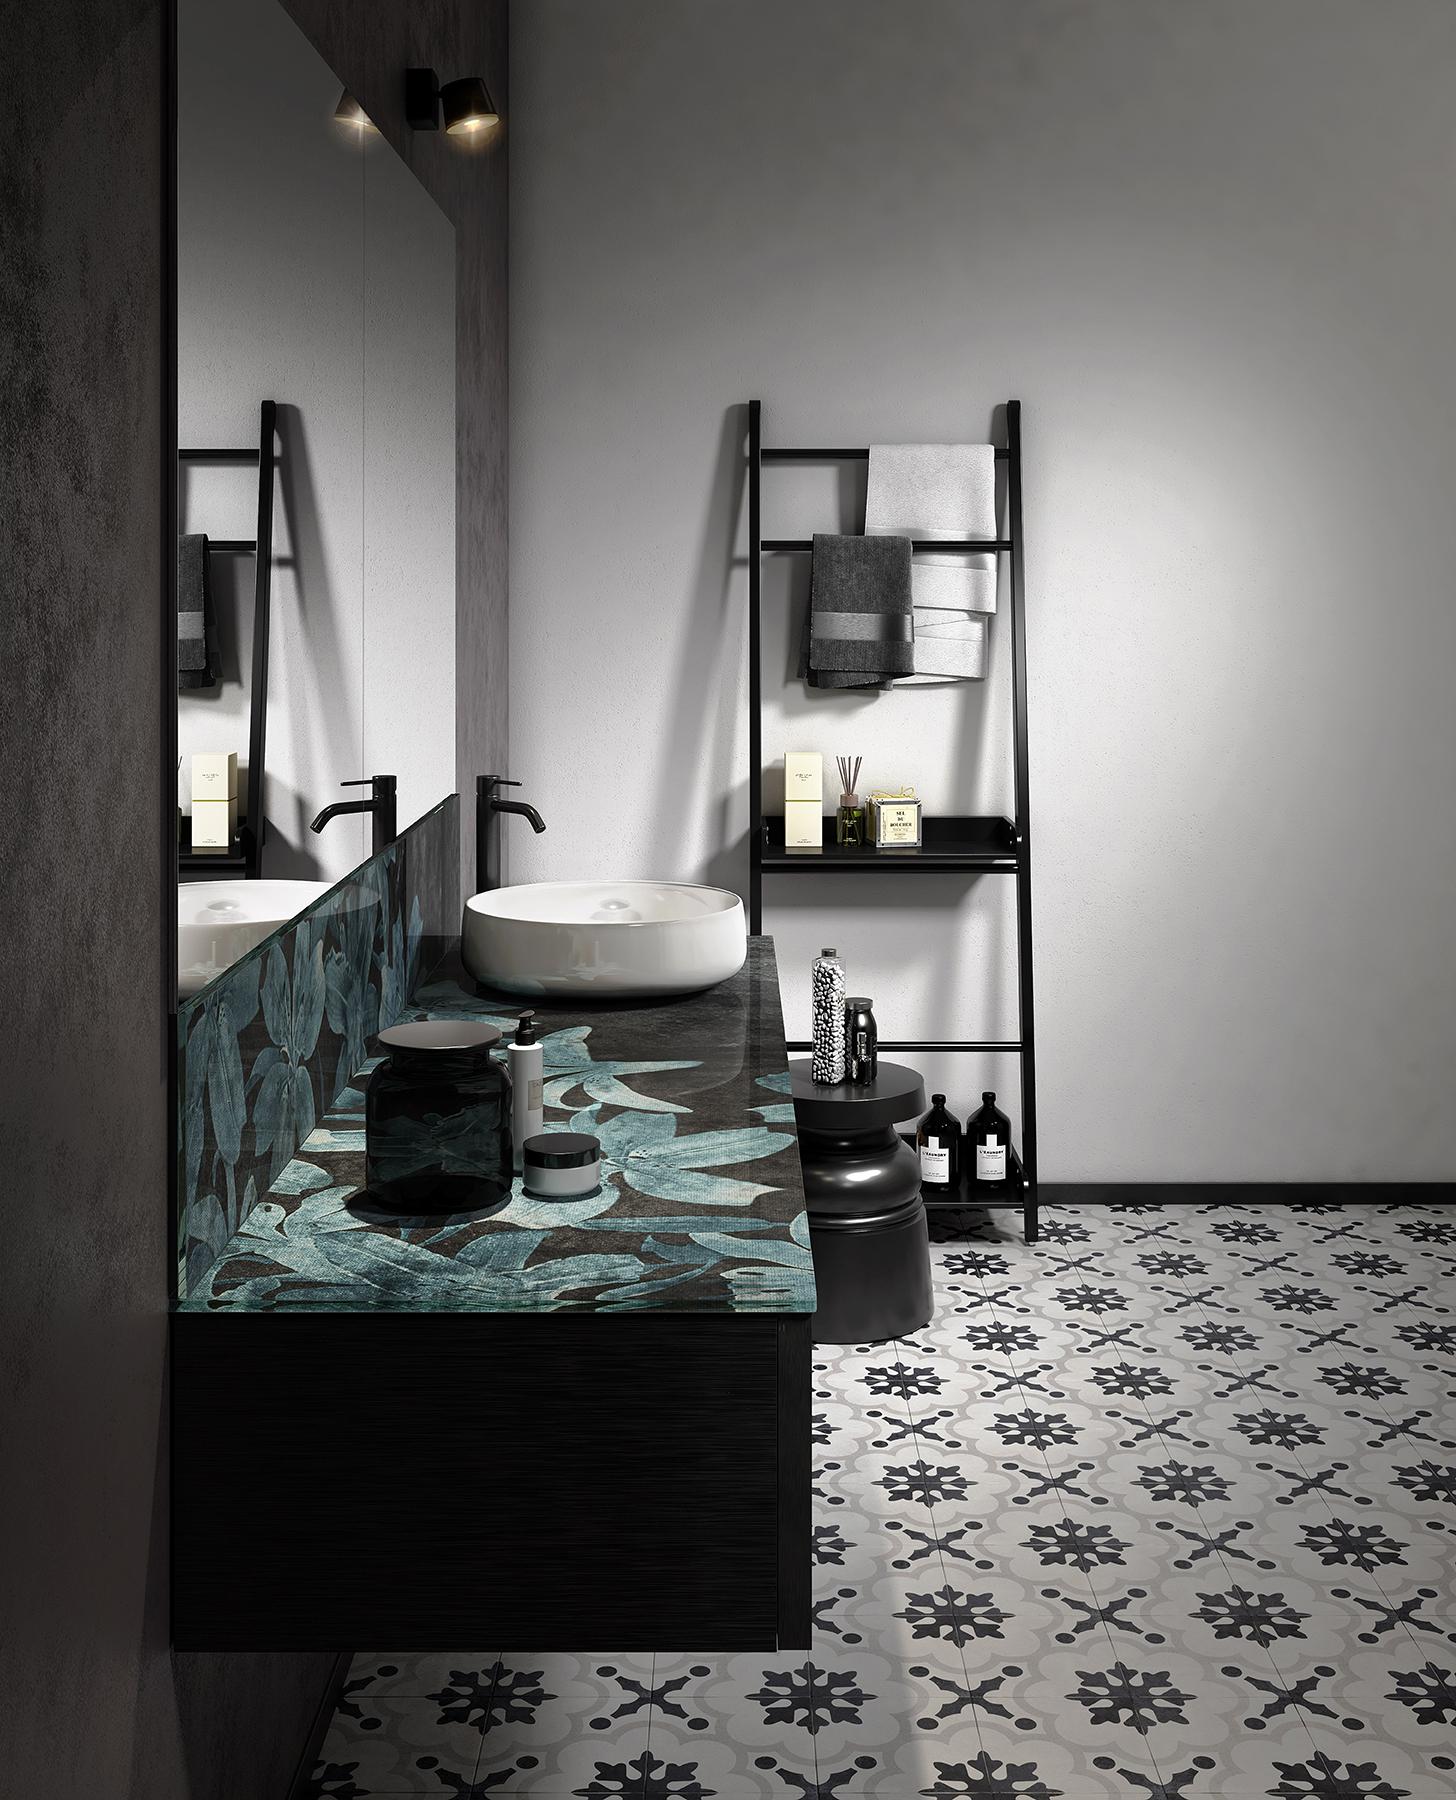 Modern +Skin Wall Mount Vanity Unit with Backsplash